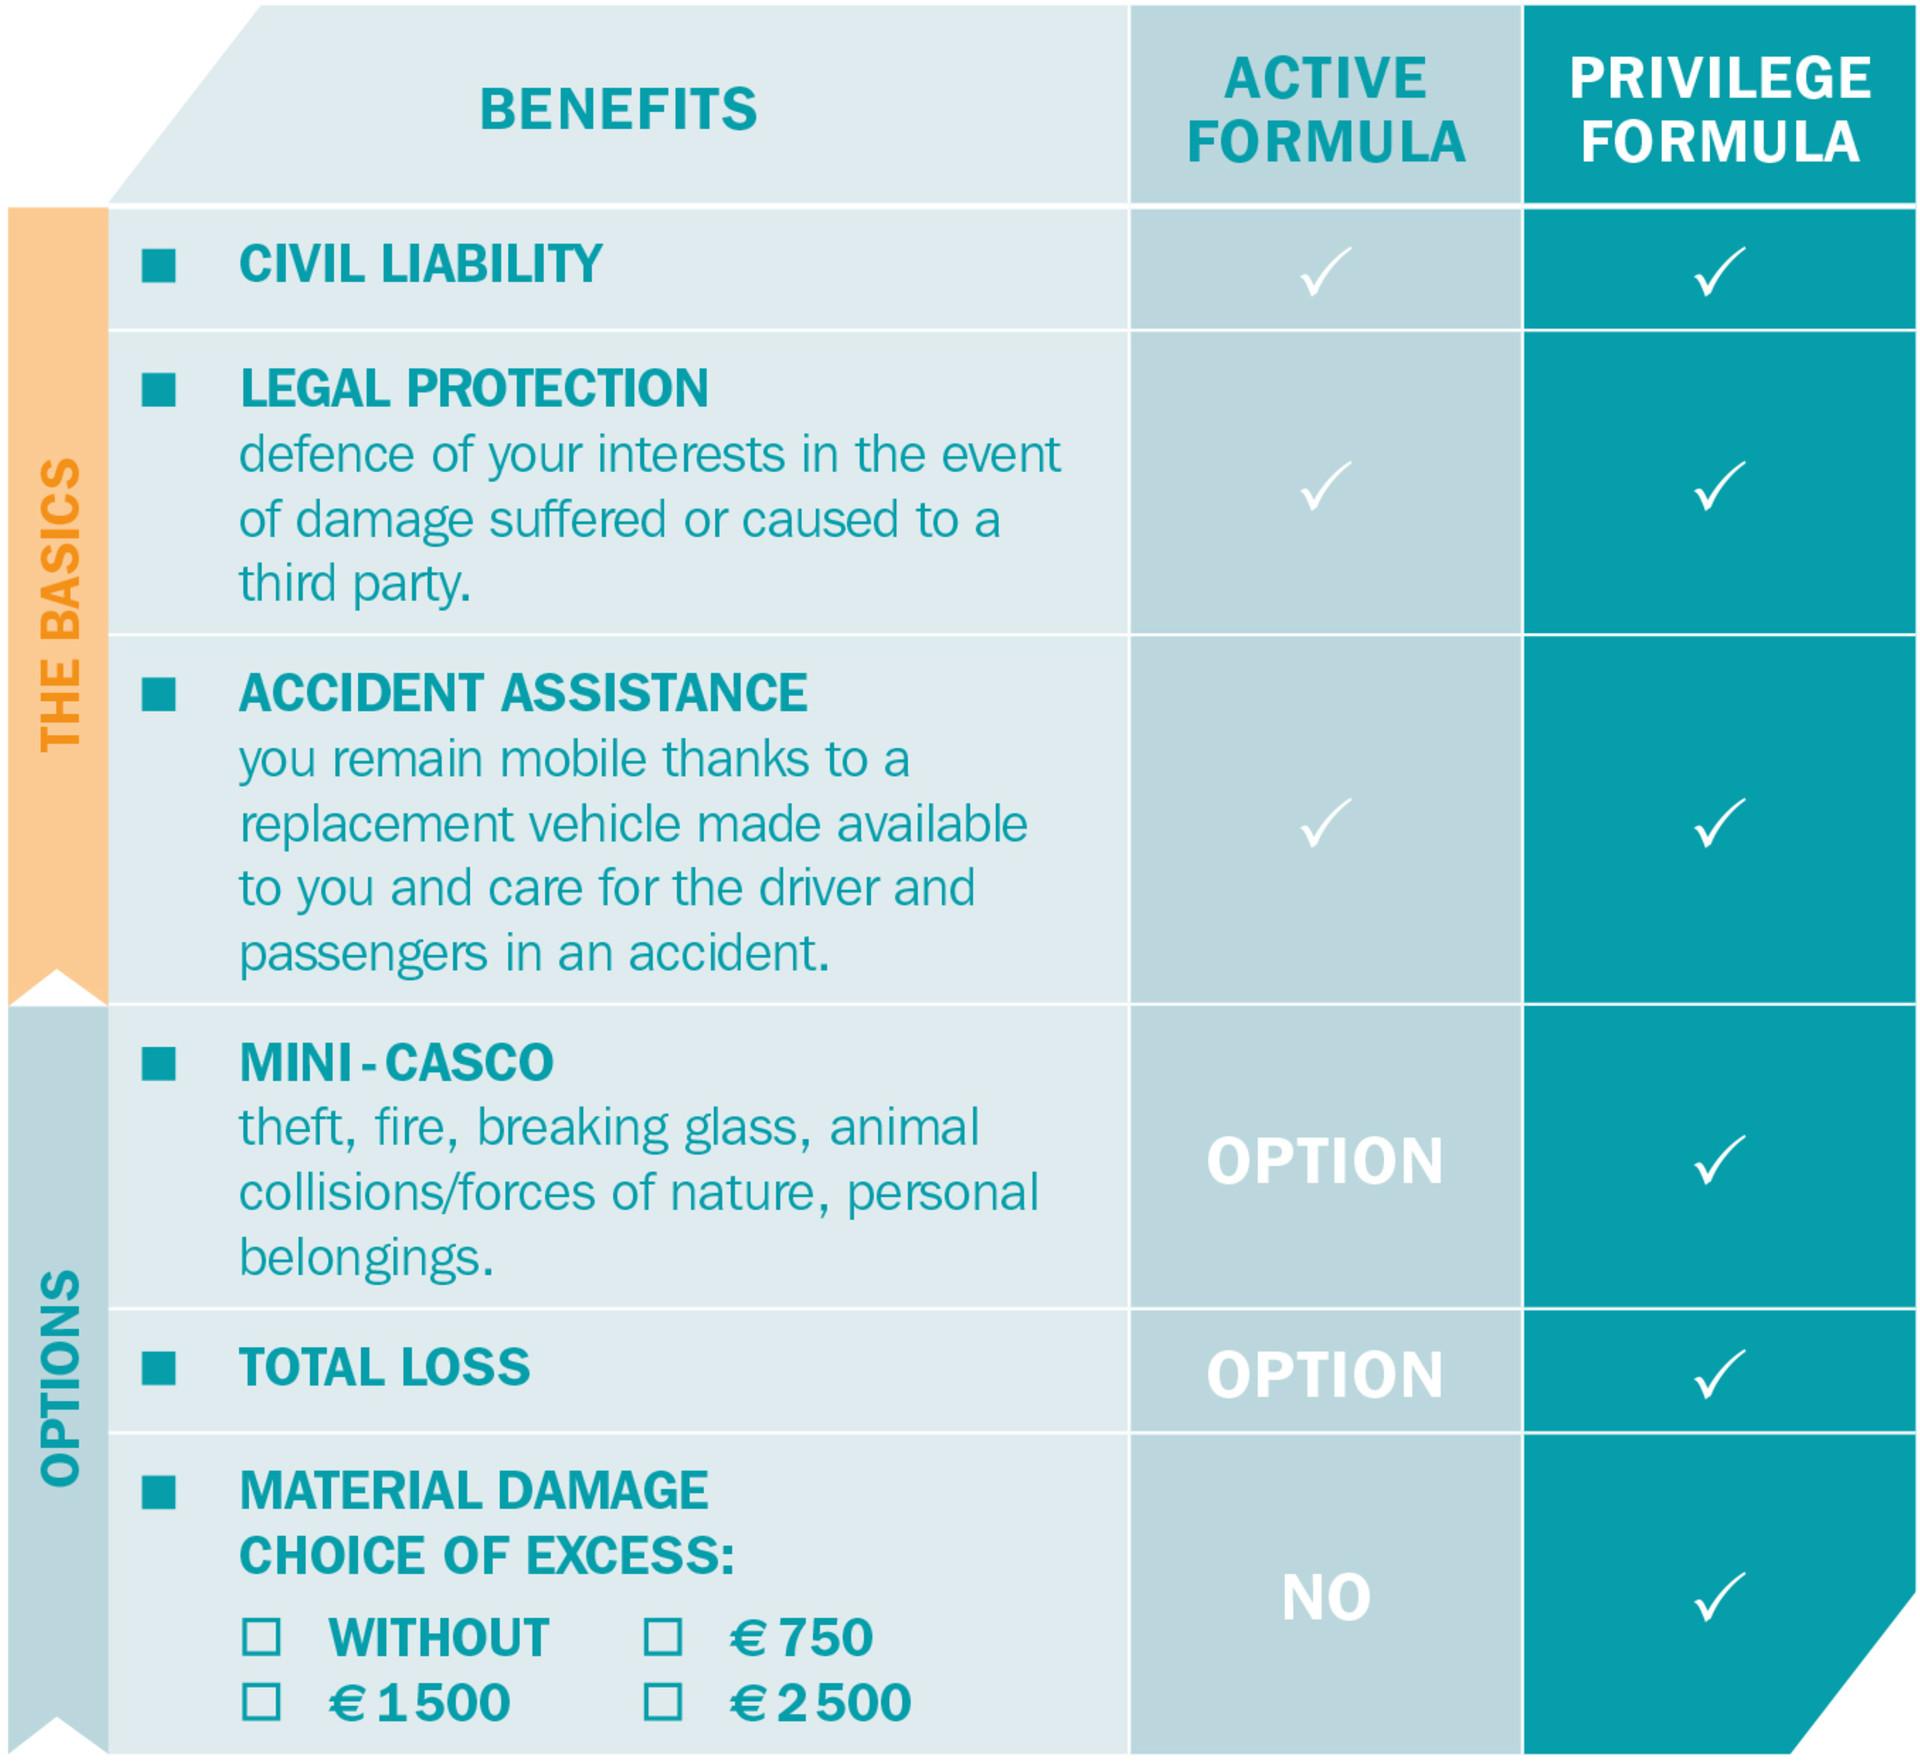 Contact Axa Car Insurance In November 2017